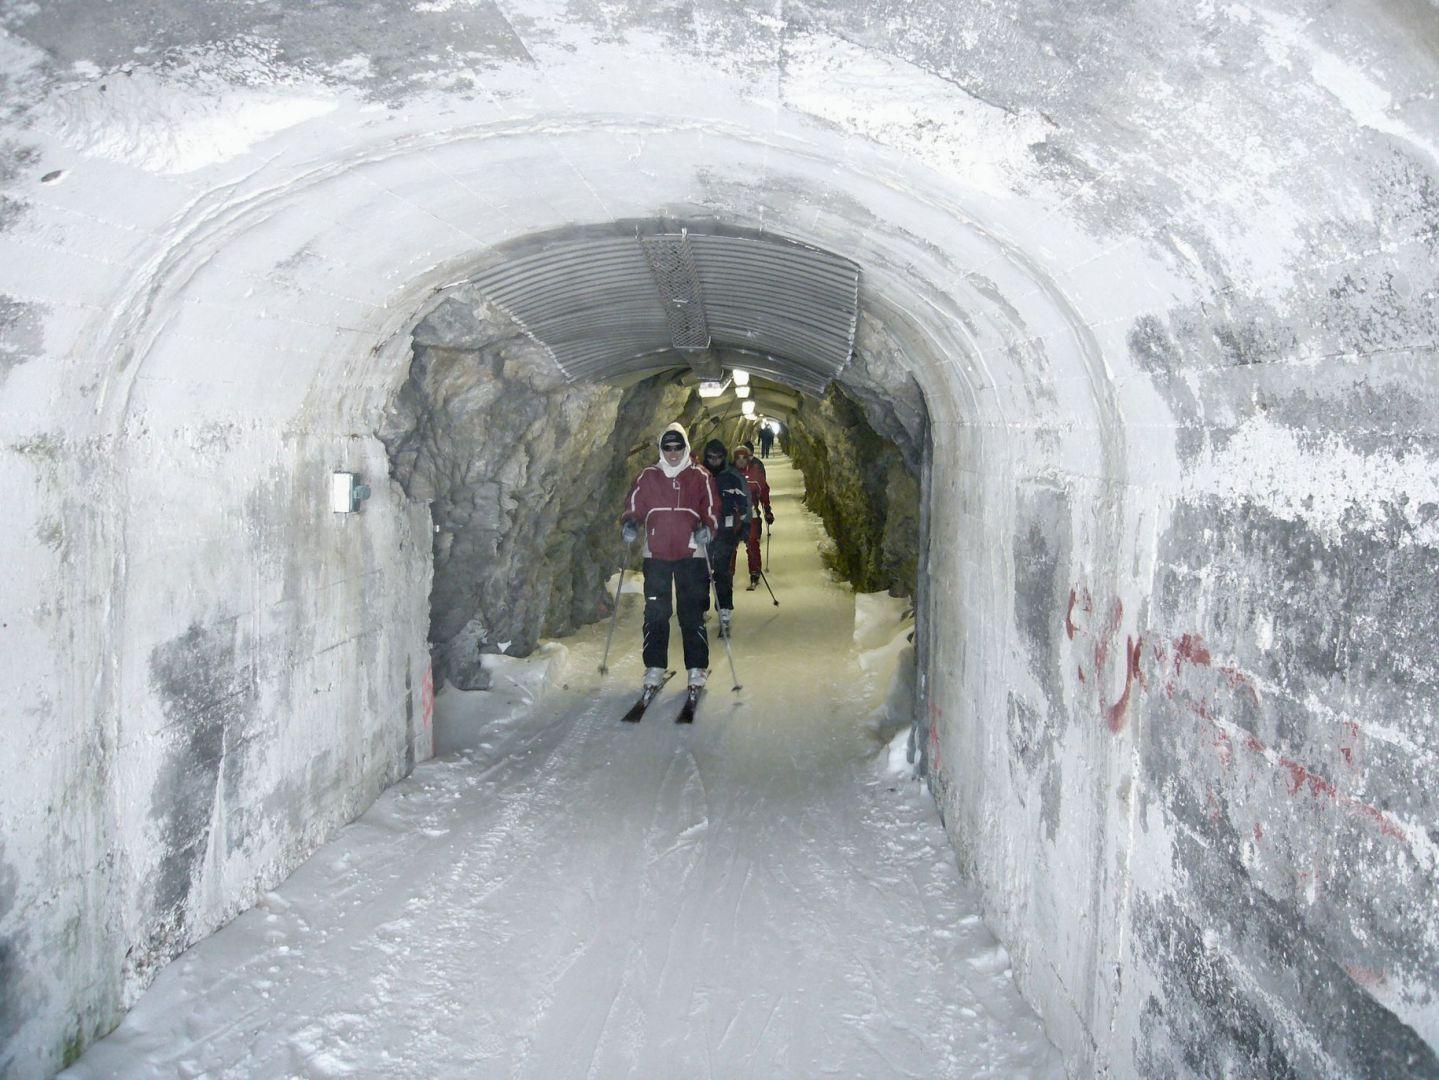 Le Tunnel, Alpe d'Huez, Франция